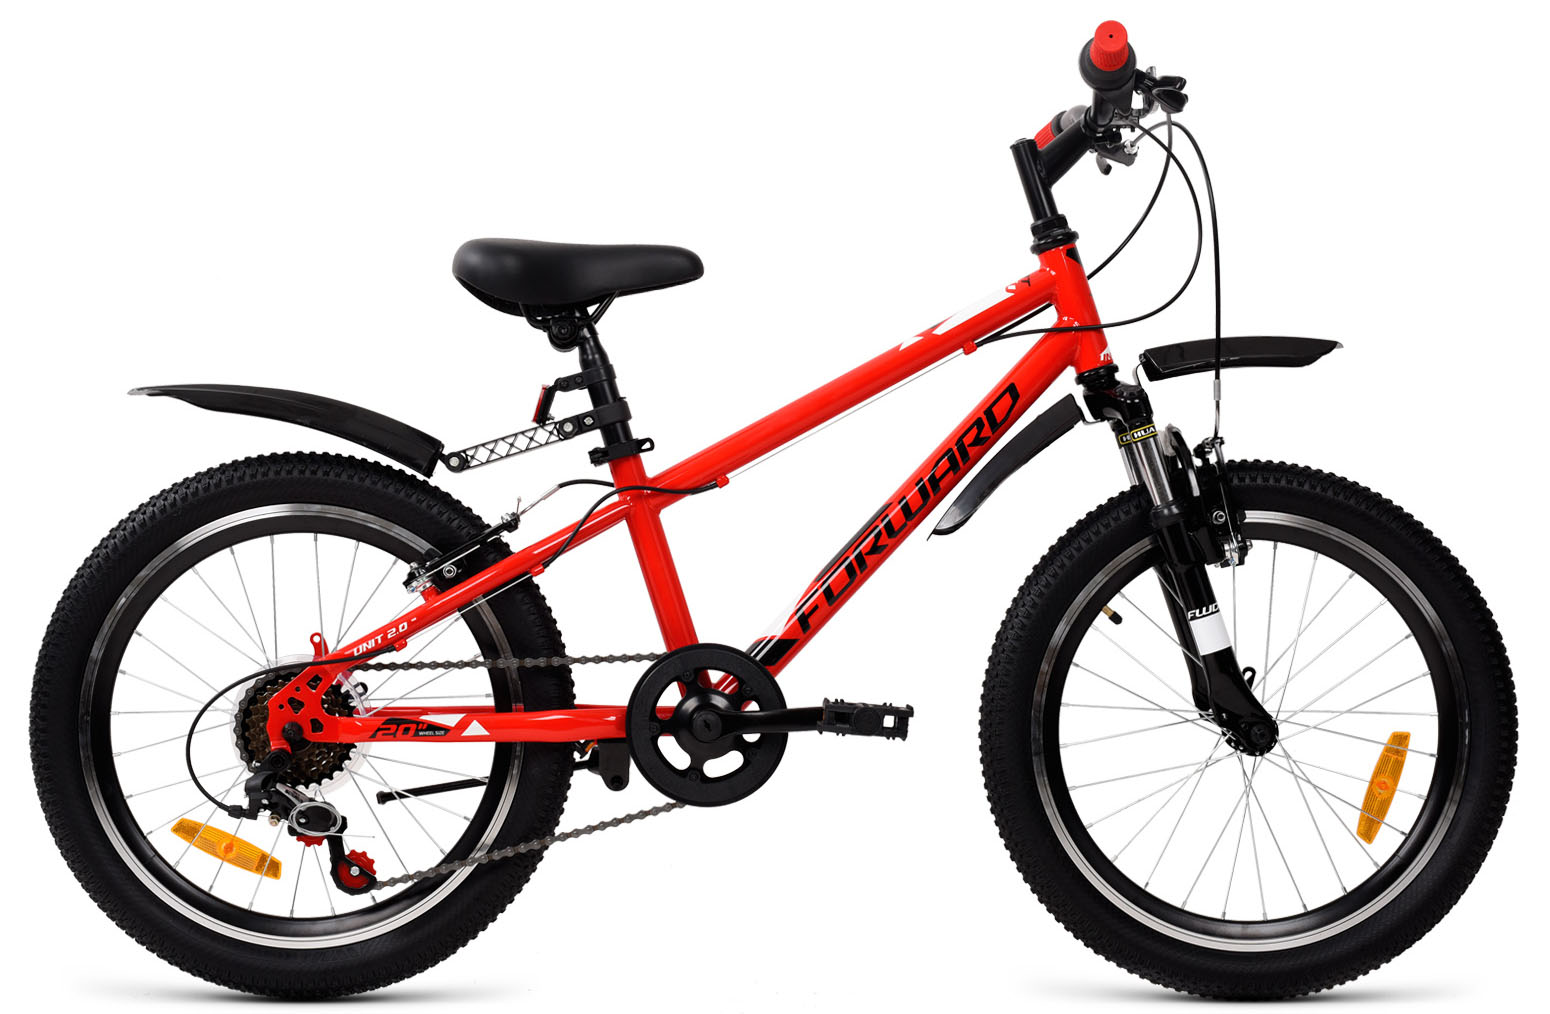 Велосипед Forward Unit 20 2.0 2019 велосипед forward nitro 16 2019